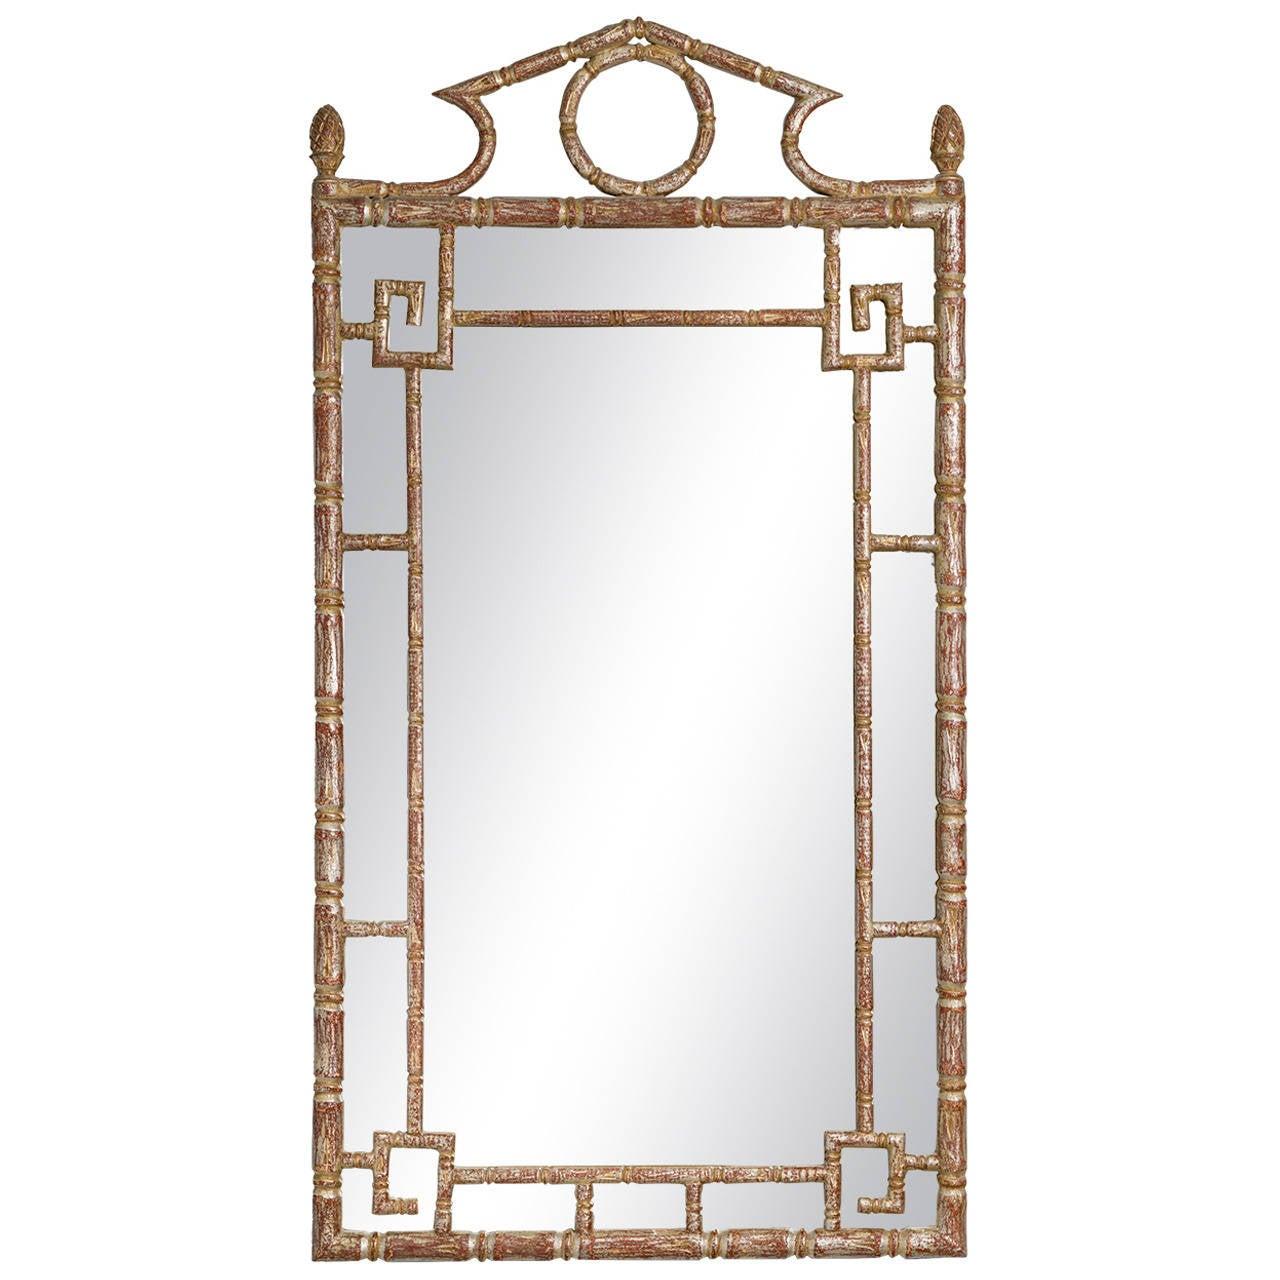 Wood greek key mirror for sale at 1stdibs jeuxipadfo Gallery